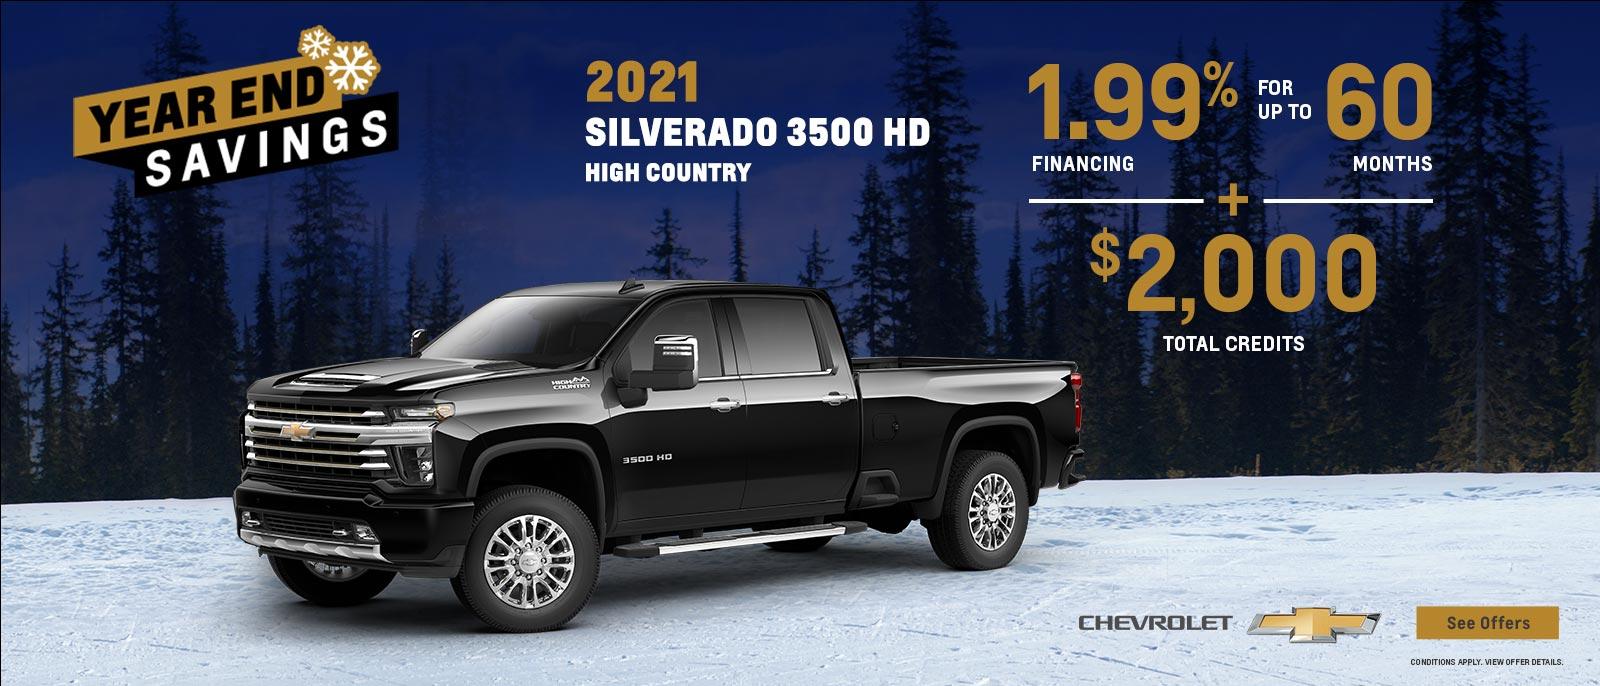 2021 Silverado 3500 HD High Country